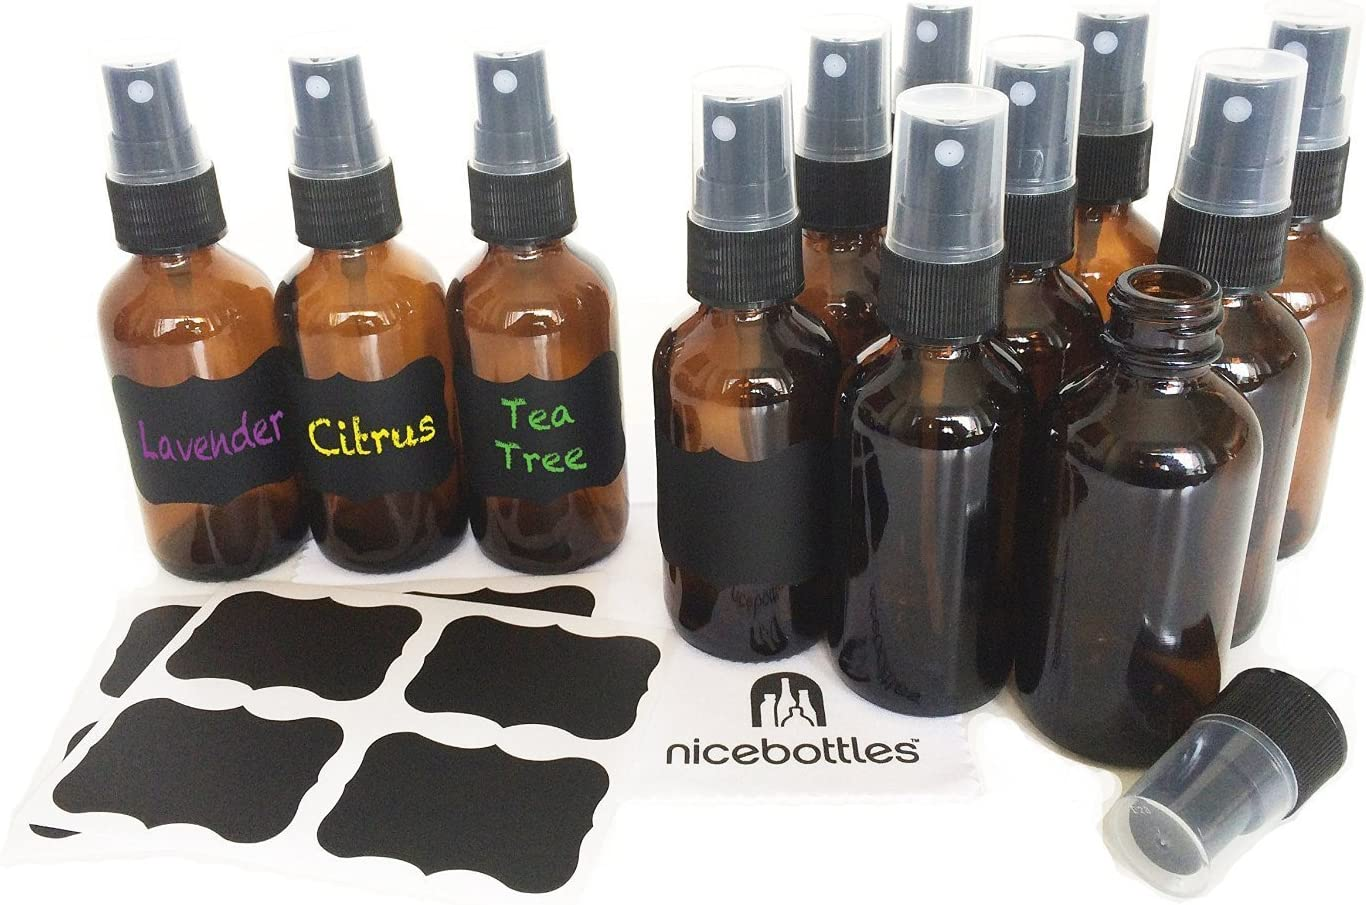 1 oz. Pack of 12 GPS DP-1G-AMBER-FMS Amber Boston Round Glass Bottle with Fine Mist Sprayer